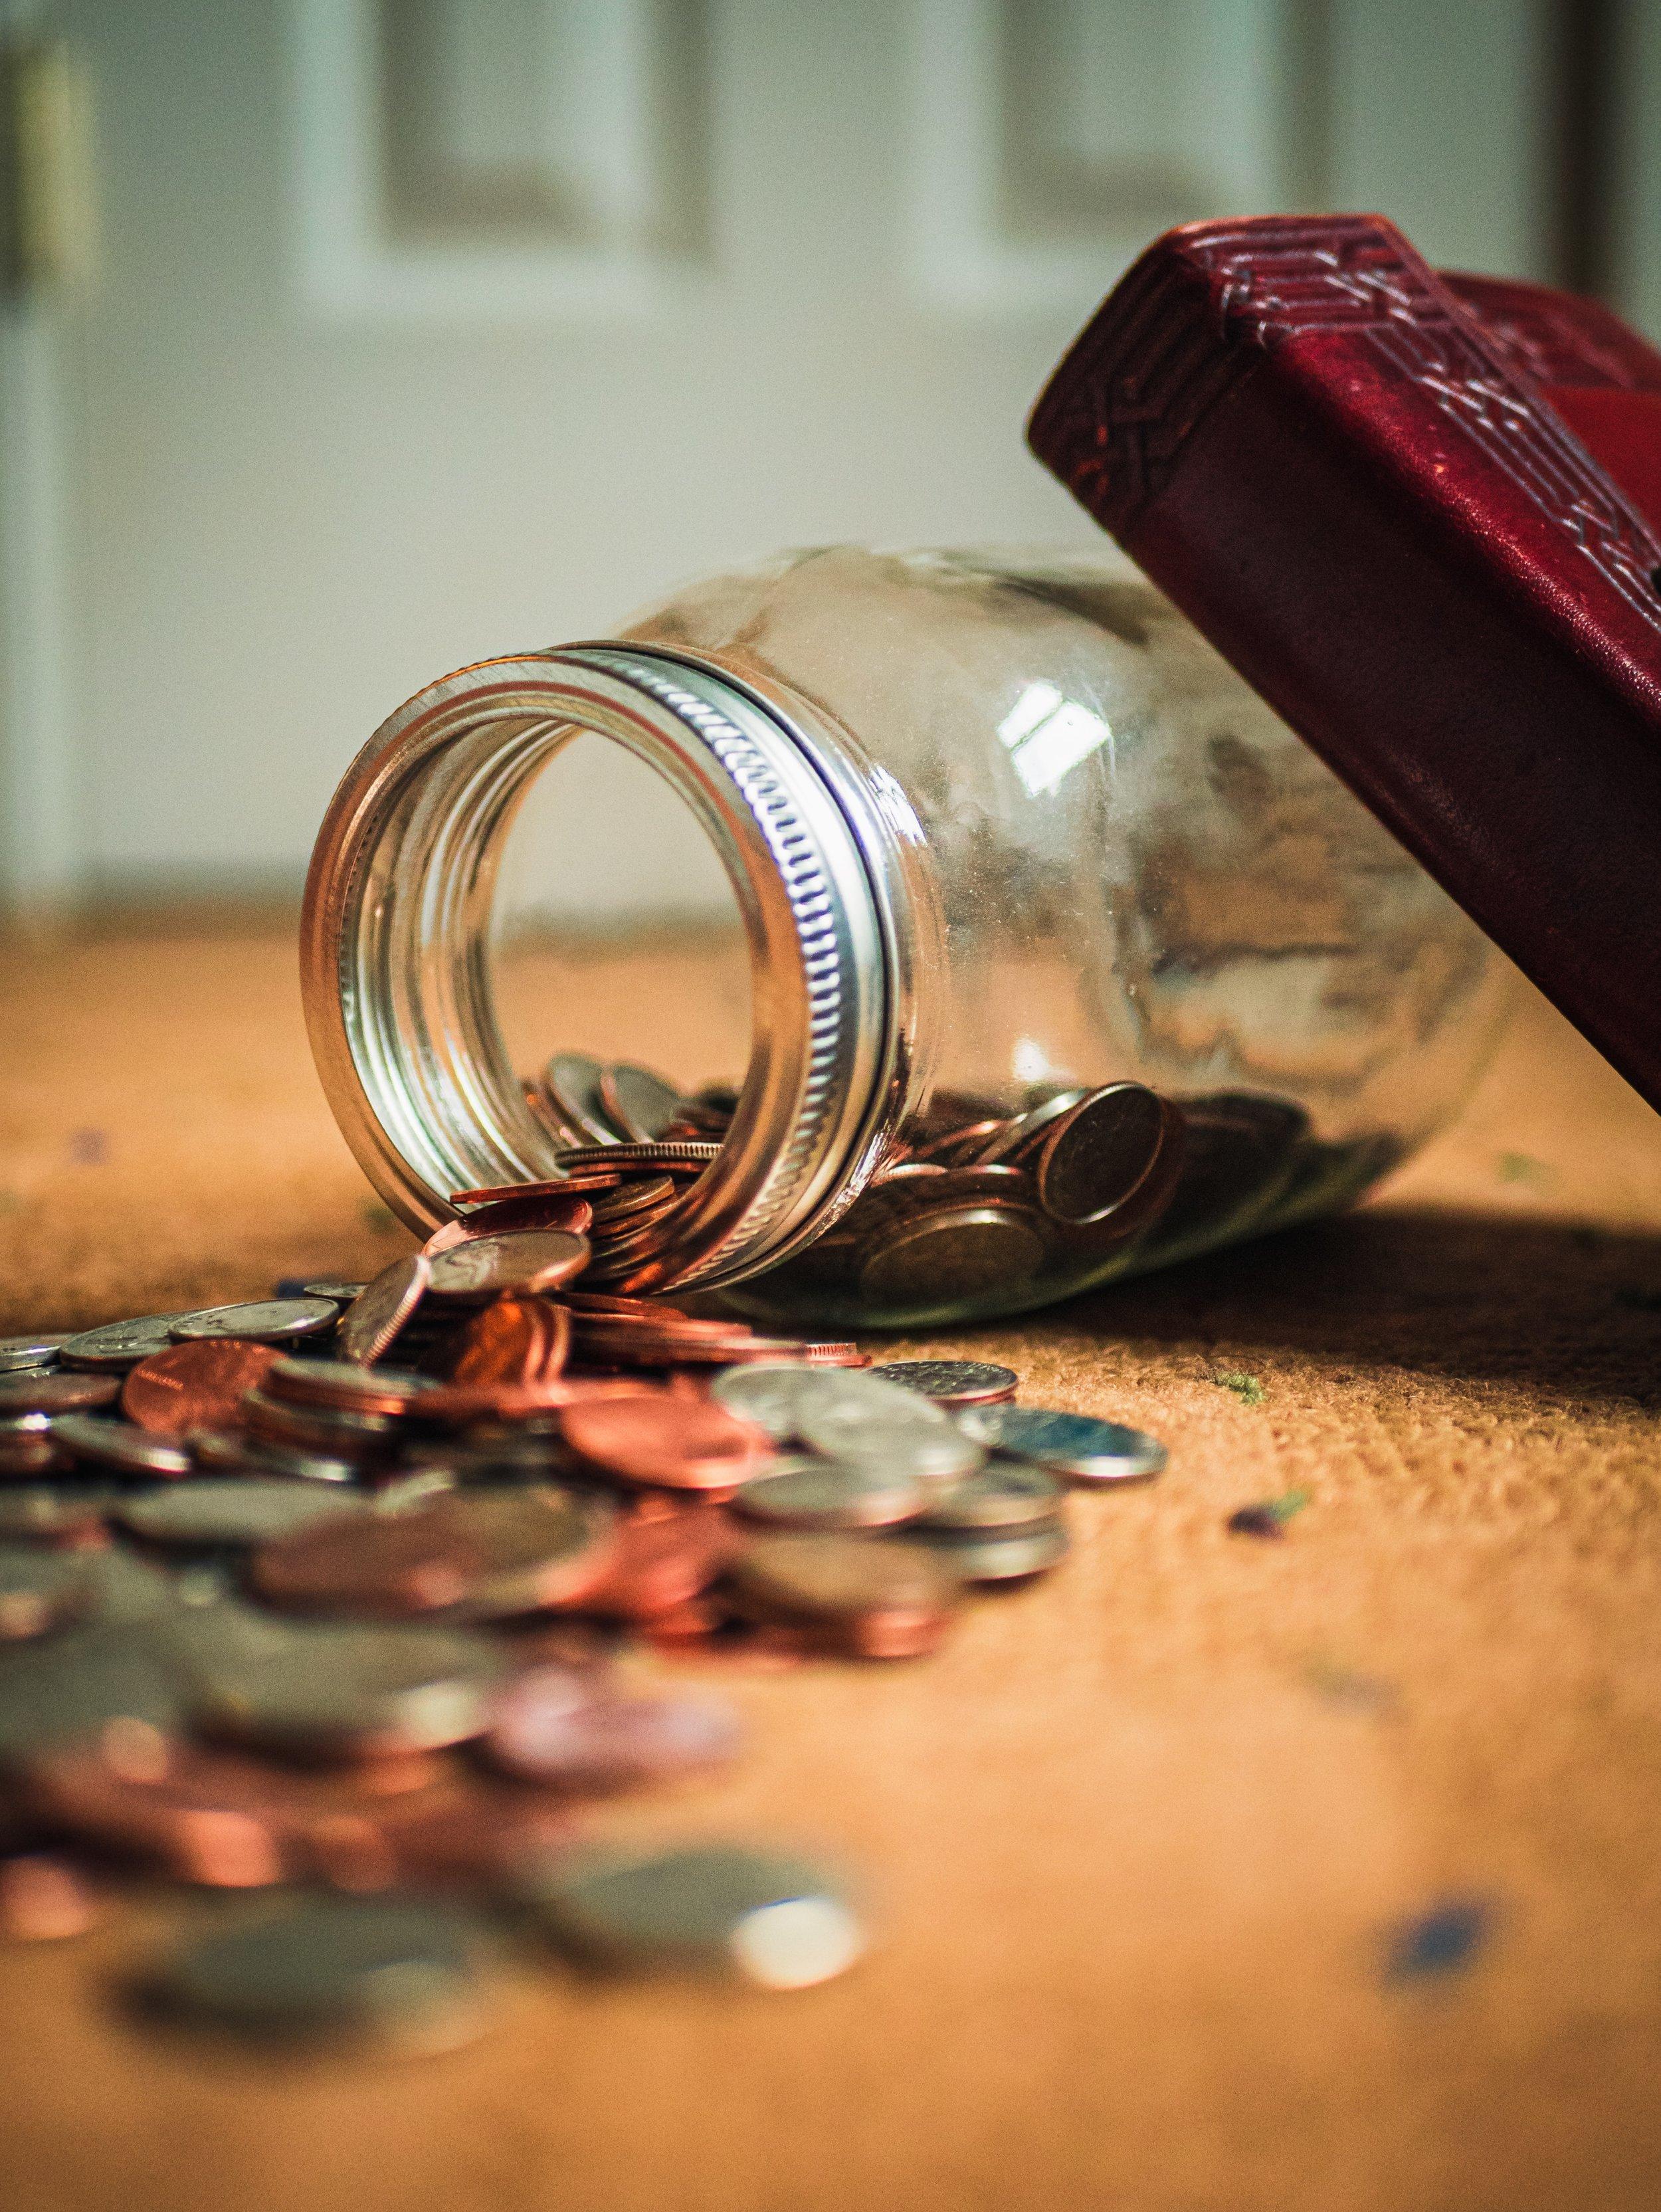 moneymanagement-moneylessons-investing-buildingwealth.jpg